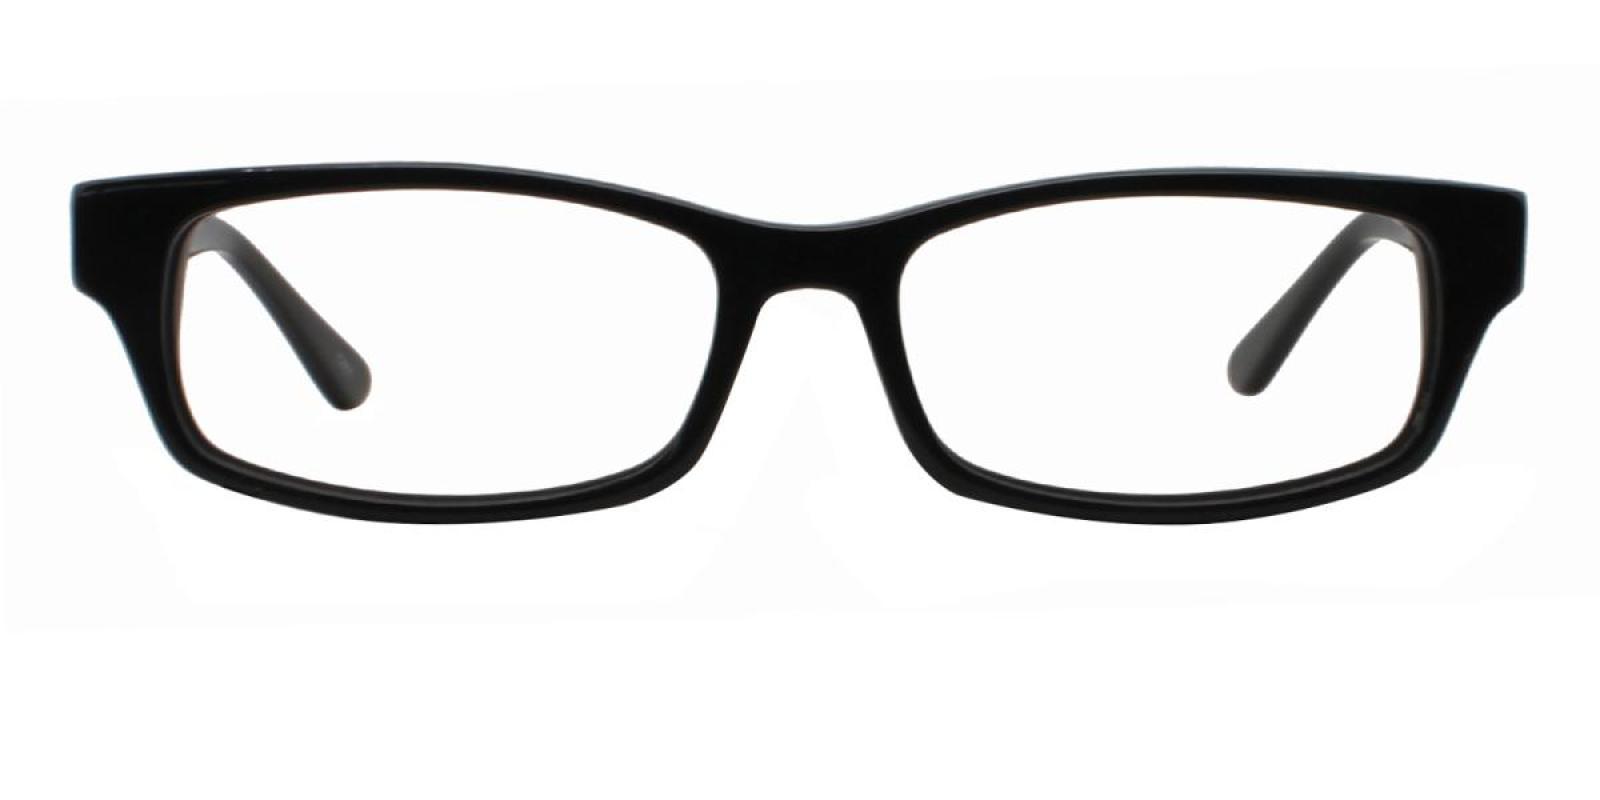 -Black-Rectangle-Acetate-Eyeglasses-additional2